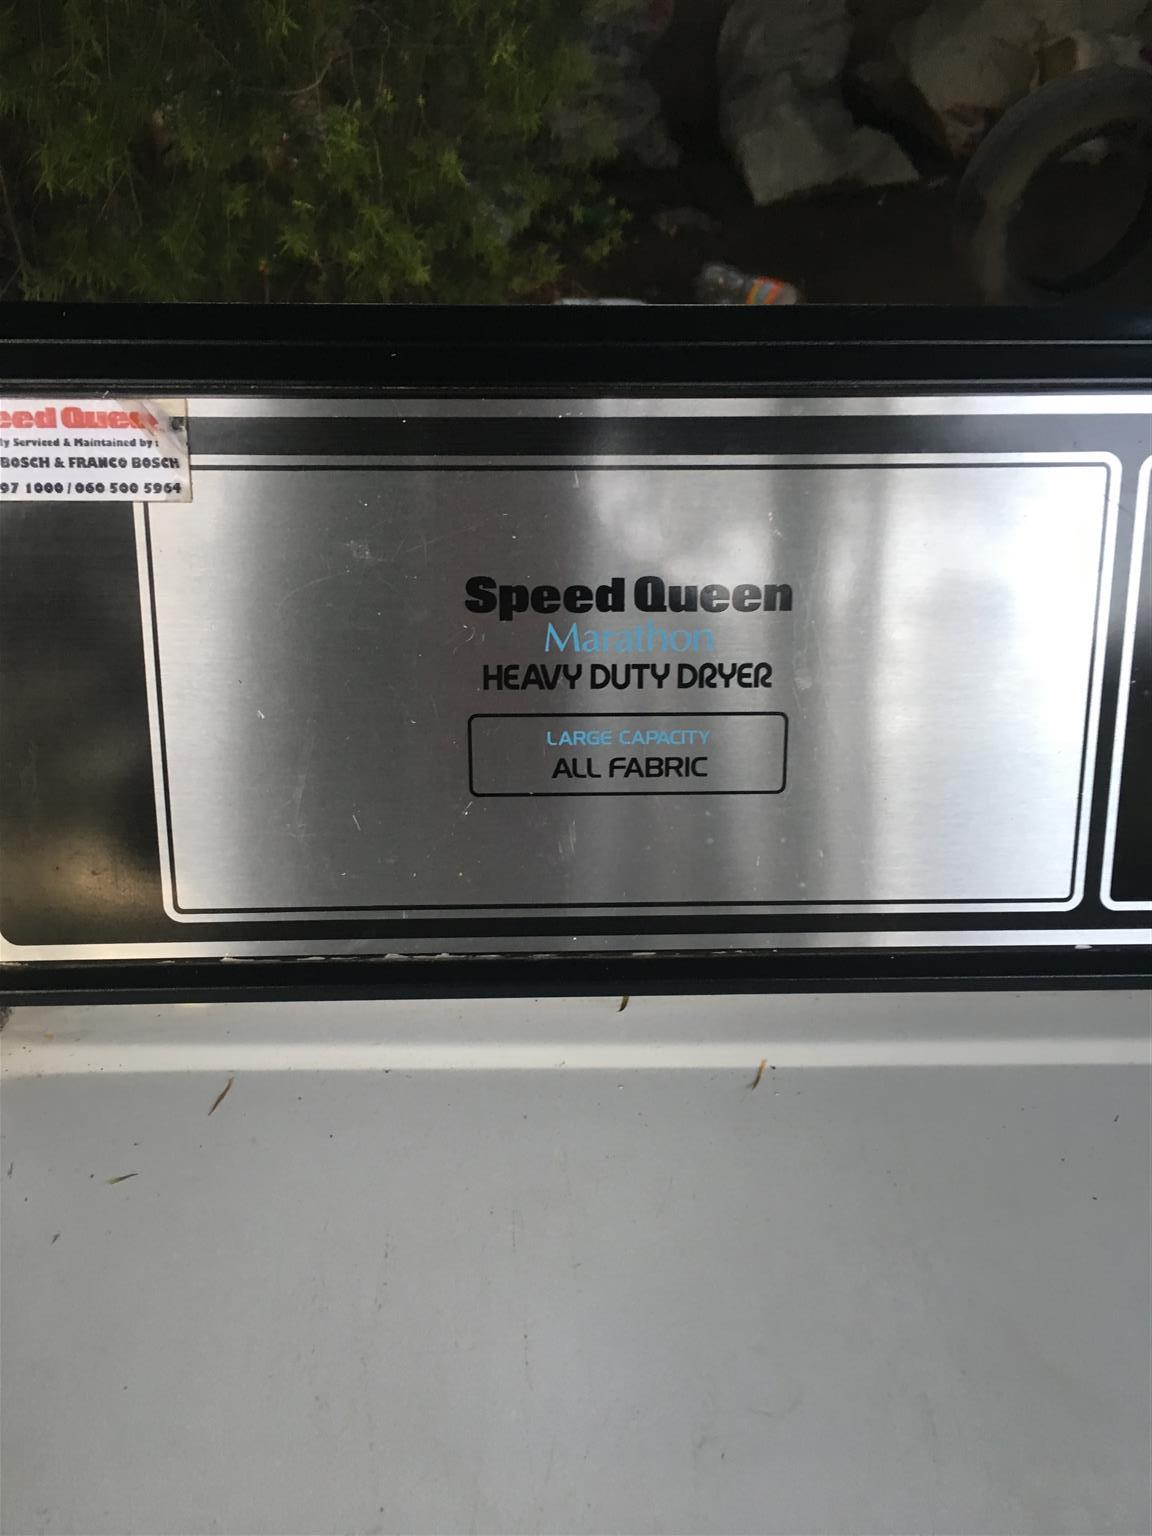 Tumble dryer, speed queen, heavy duty